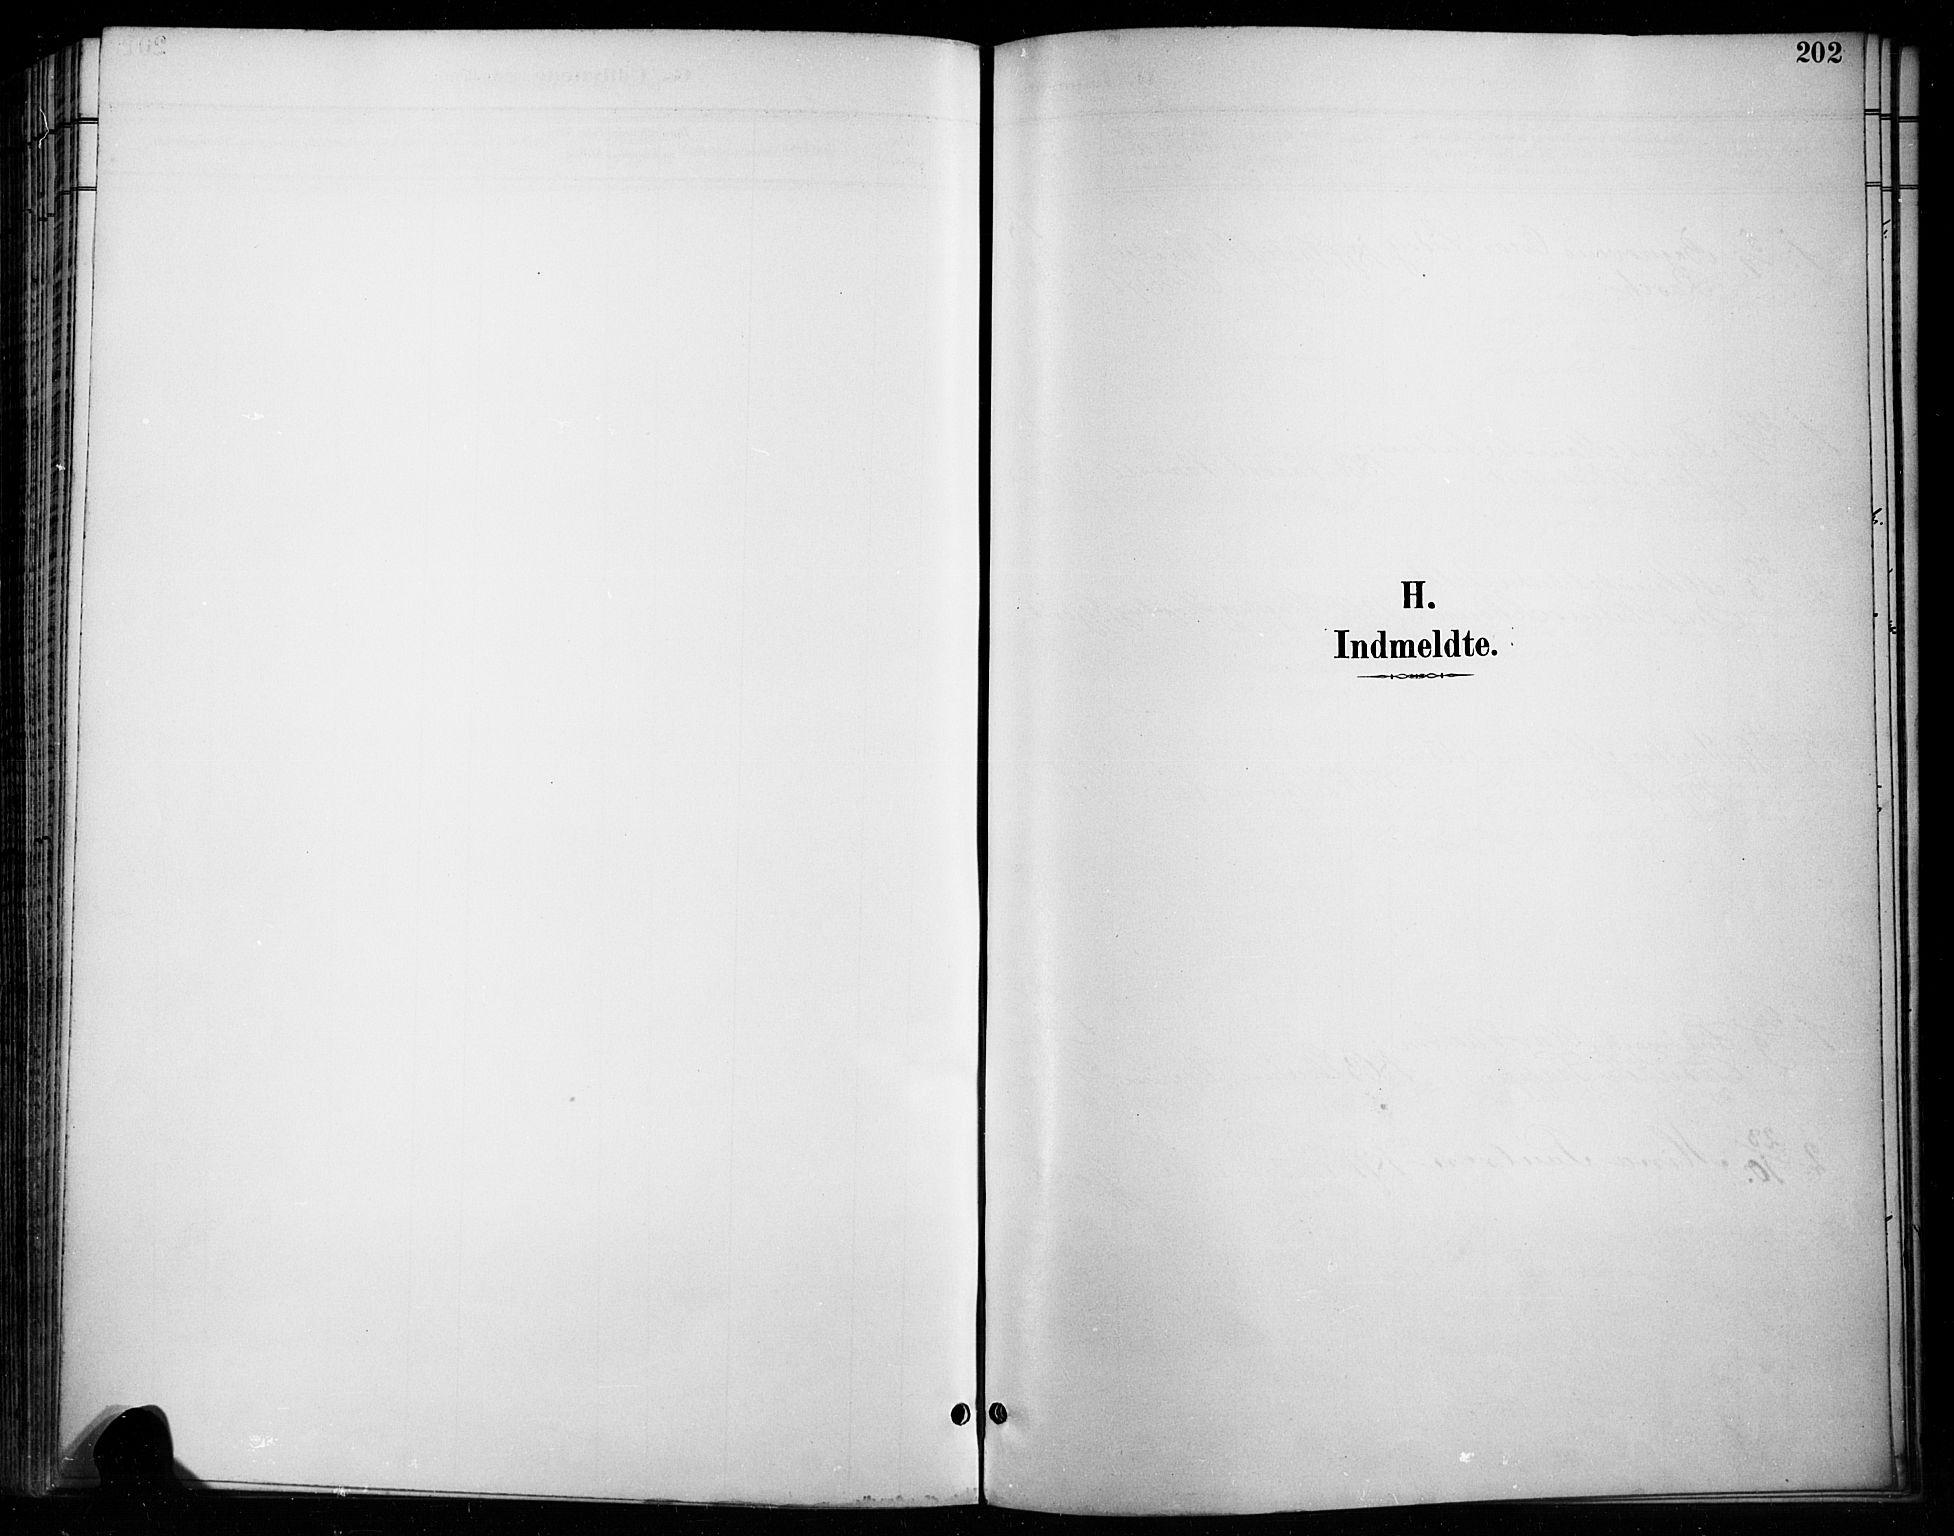 SAH, Vardal prestekontor, H/Ha/Haa/L0011: Ministerialbok nr. 11, 1891-1901, s. 202